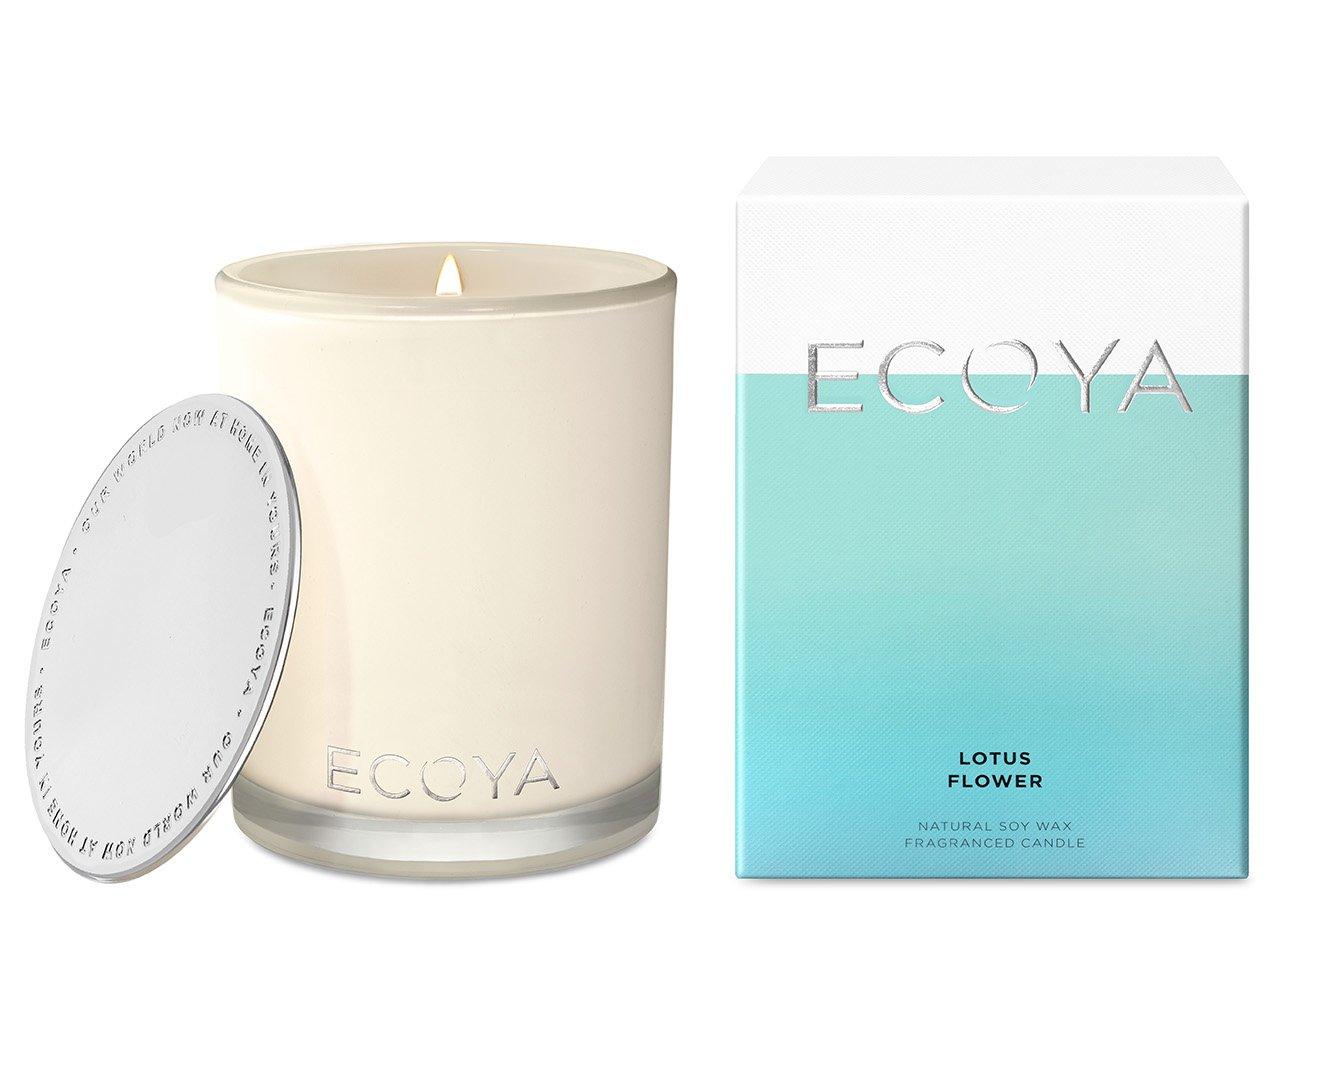 Ecoya Madison Jar Scented Candle in Lotus Flower Fragrance